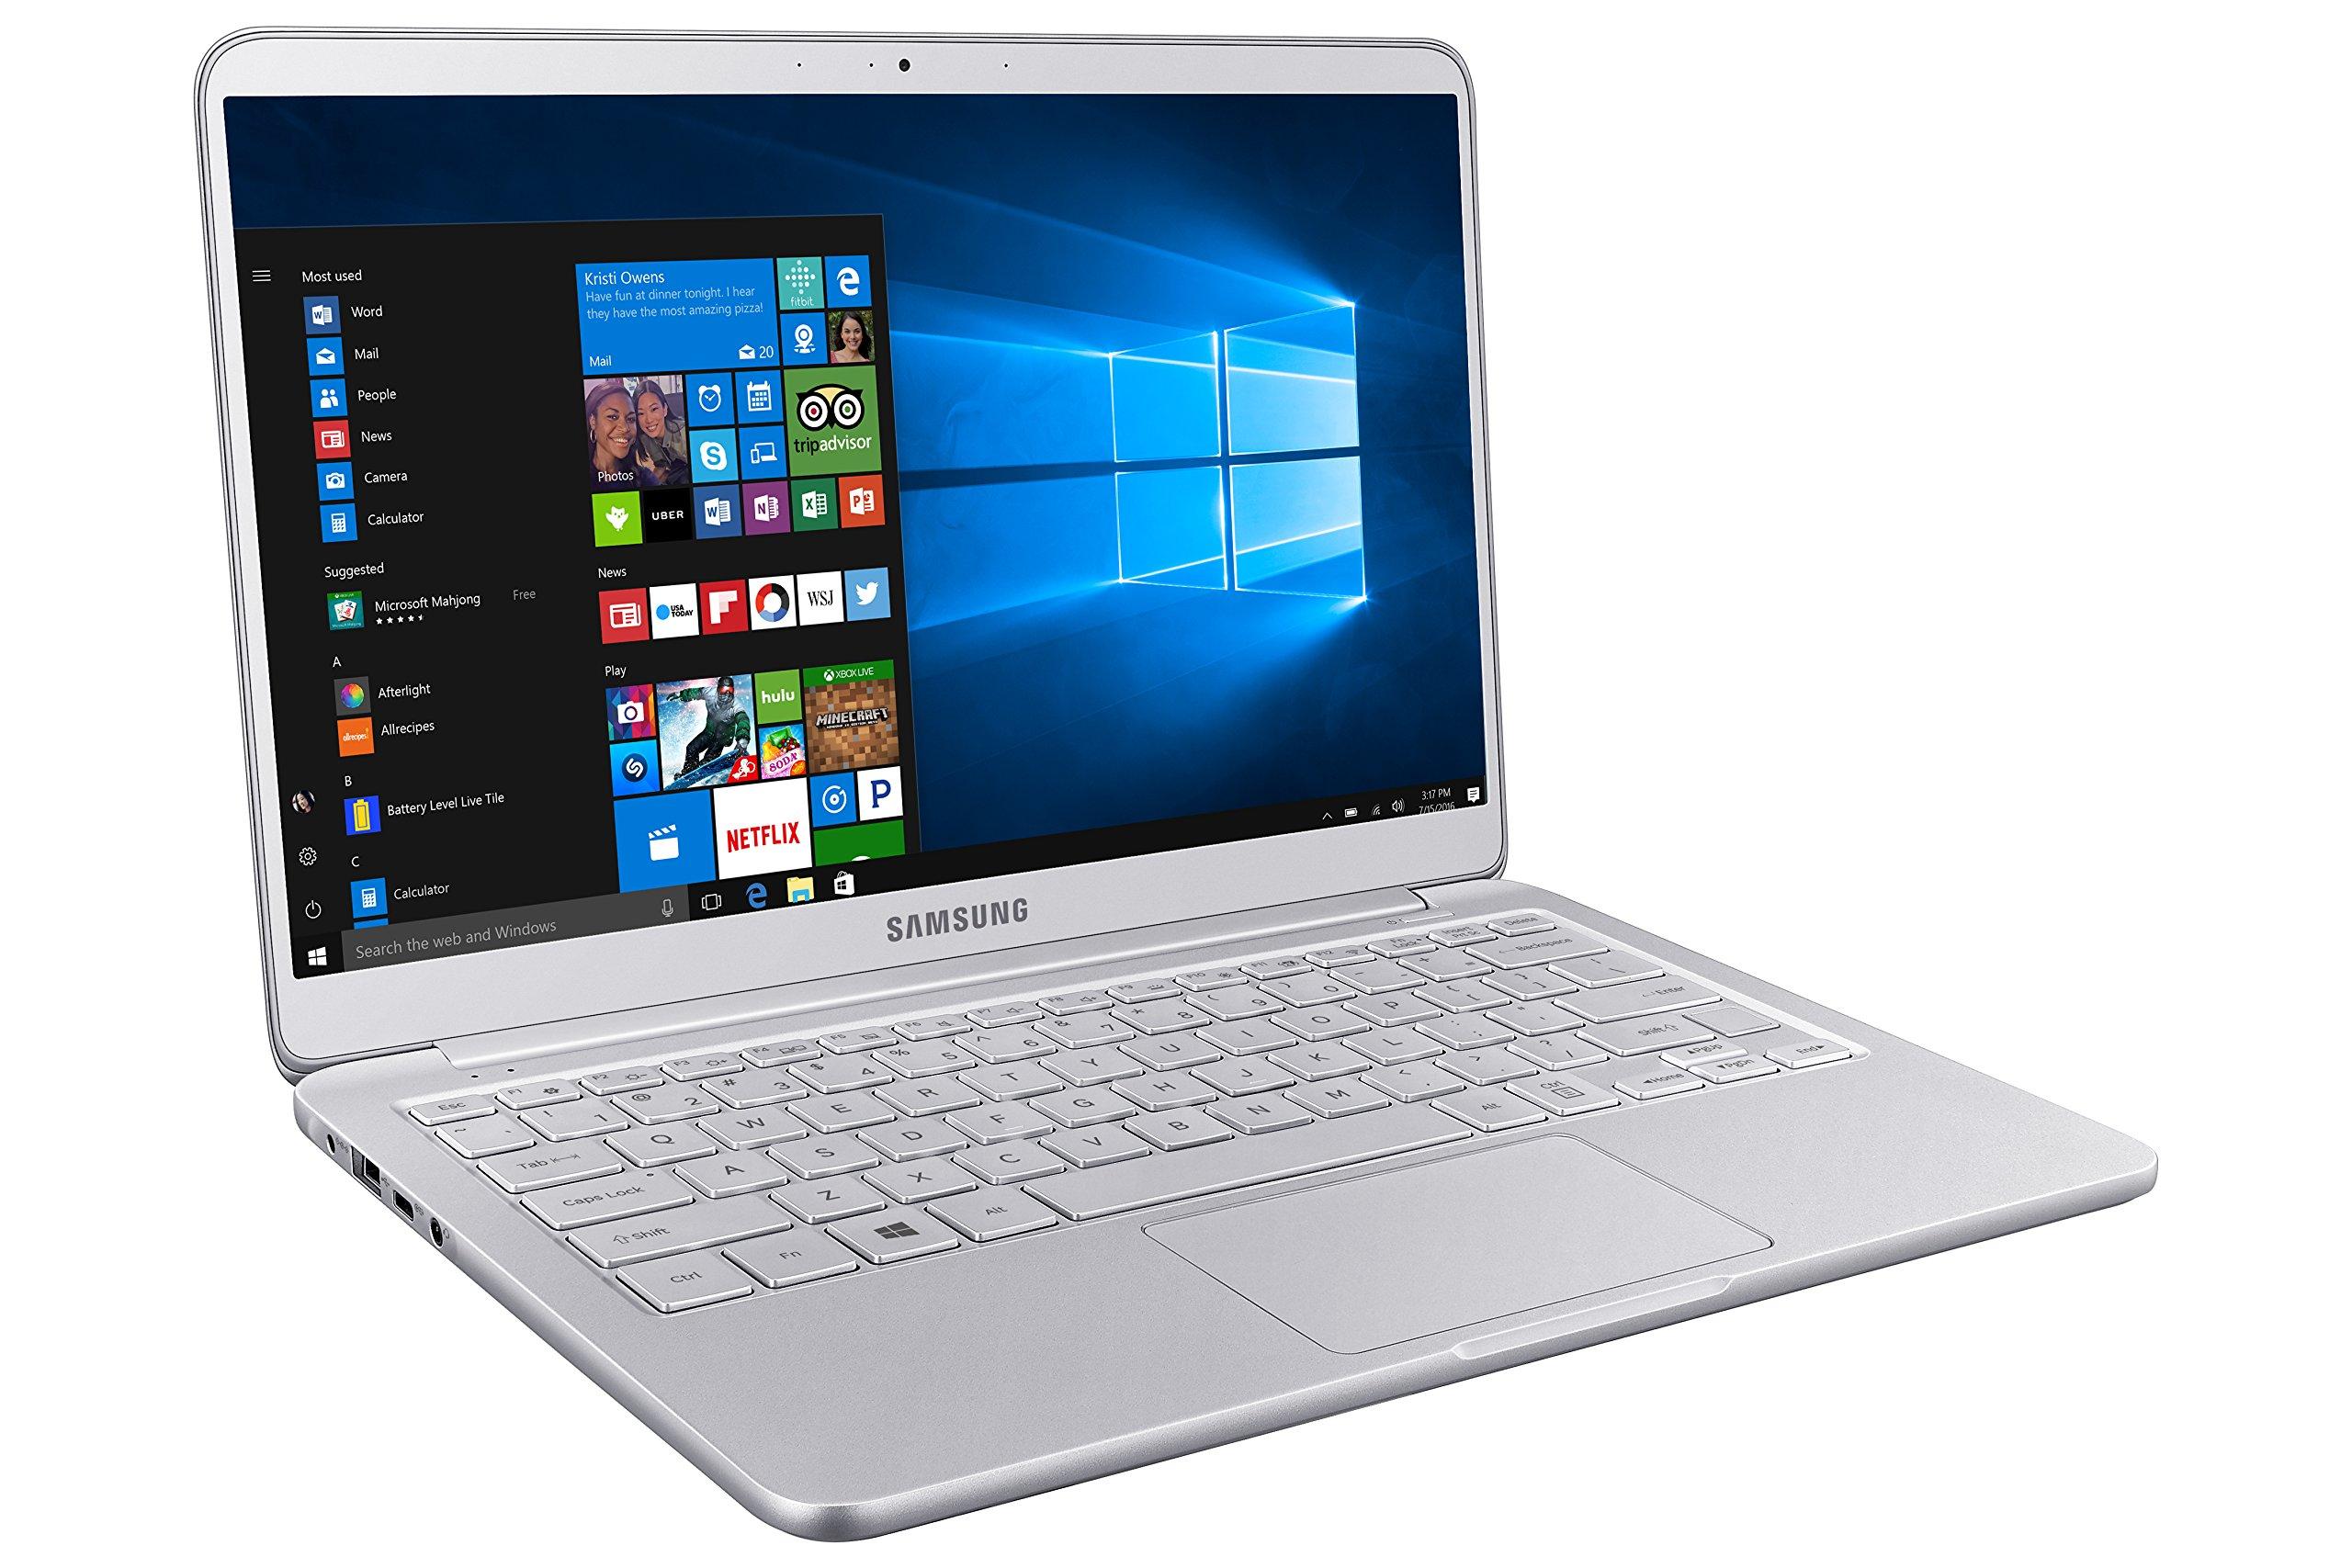 Samsung Notebook 9 Ultra-Slim Laptop, 13.3'' Full HD, Intel i7-7500U, 16GB RAM, Windows 10 Home, Fingerprint Sensor, 1.8lbs, Light Titan - NP900X3N-K04US